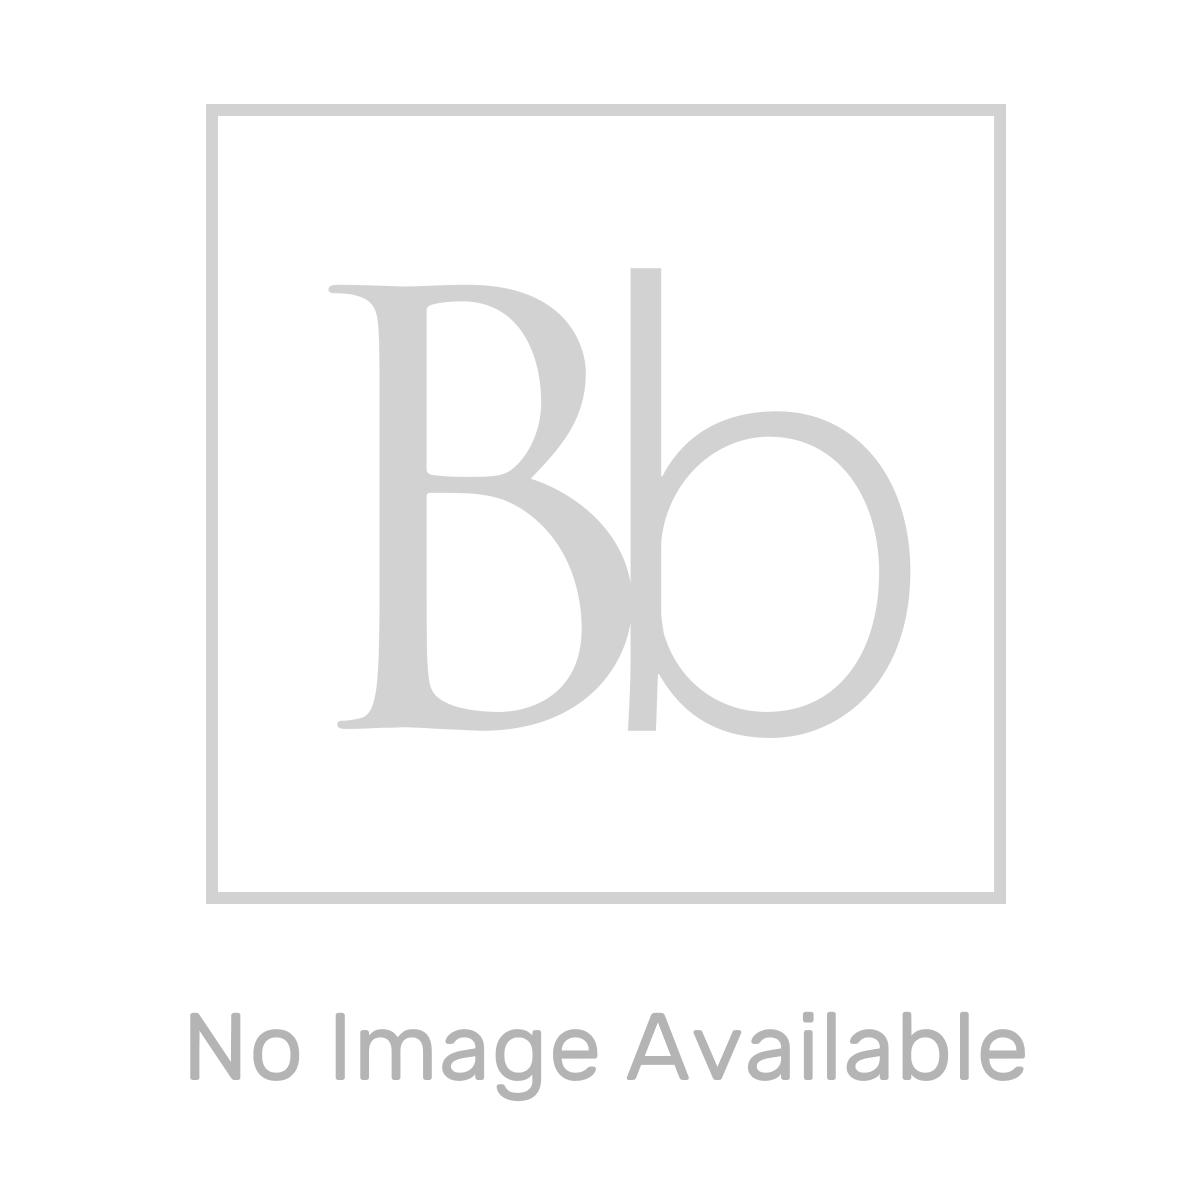 RAK Series 600 Left Handed P Shaped Shower Bath Suite Drawing